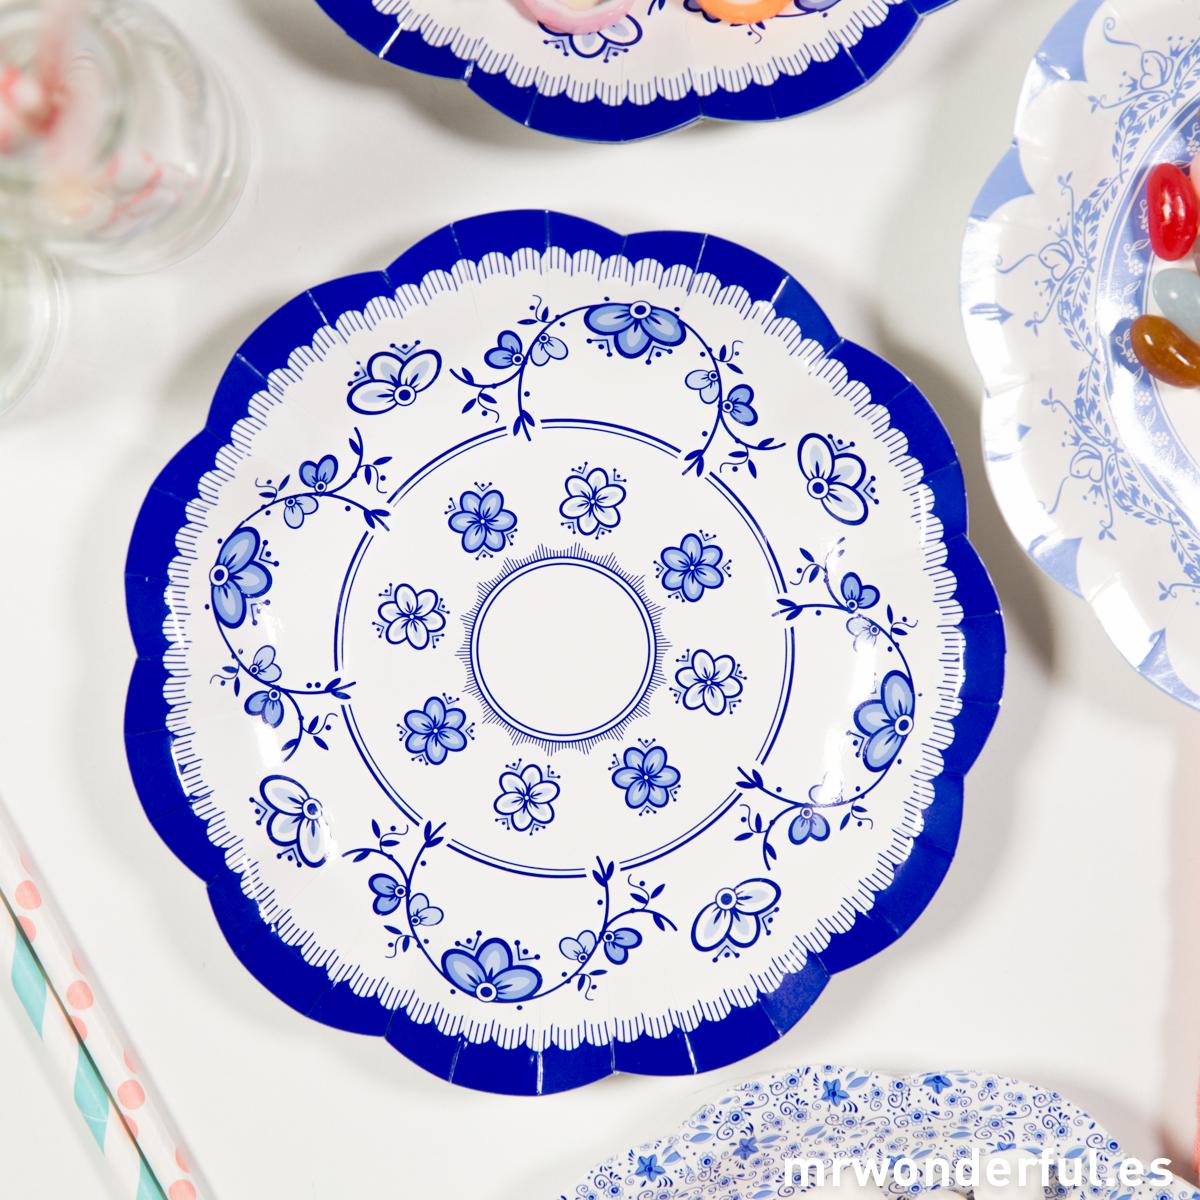 mrwonderful_PPB-PLATE-SML-Surtido-platos-pequeños-papel-estampado-porcelana-17